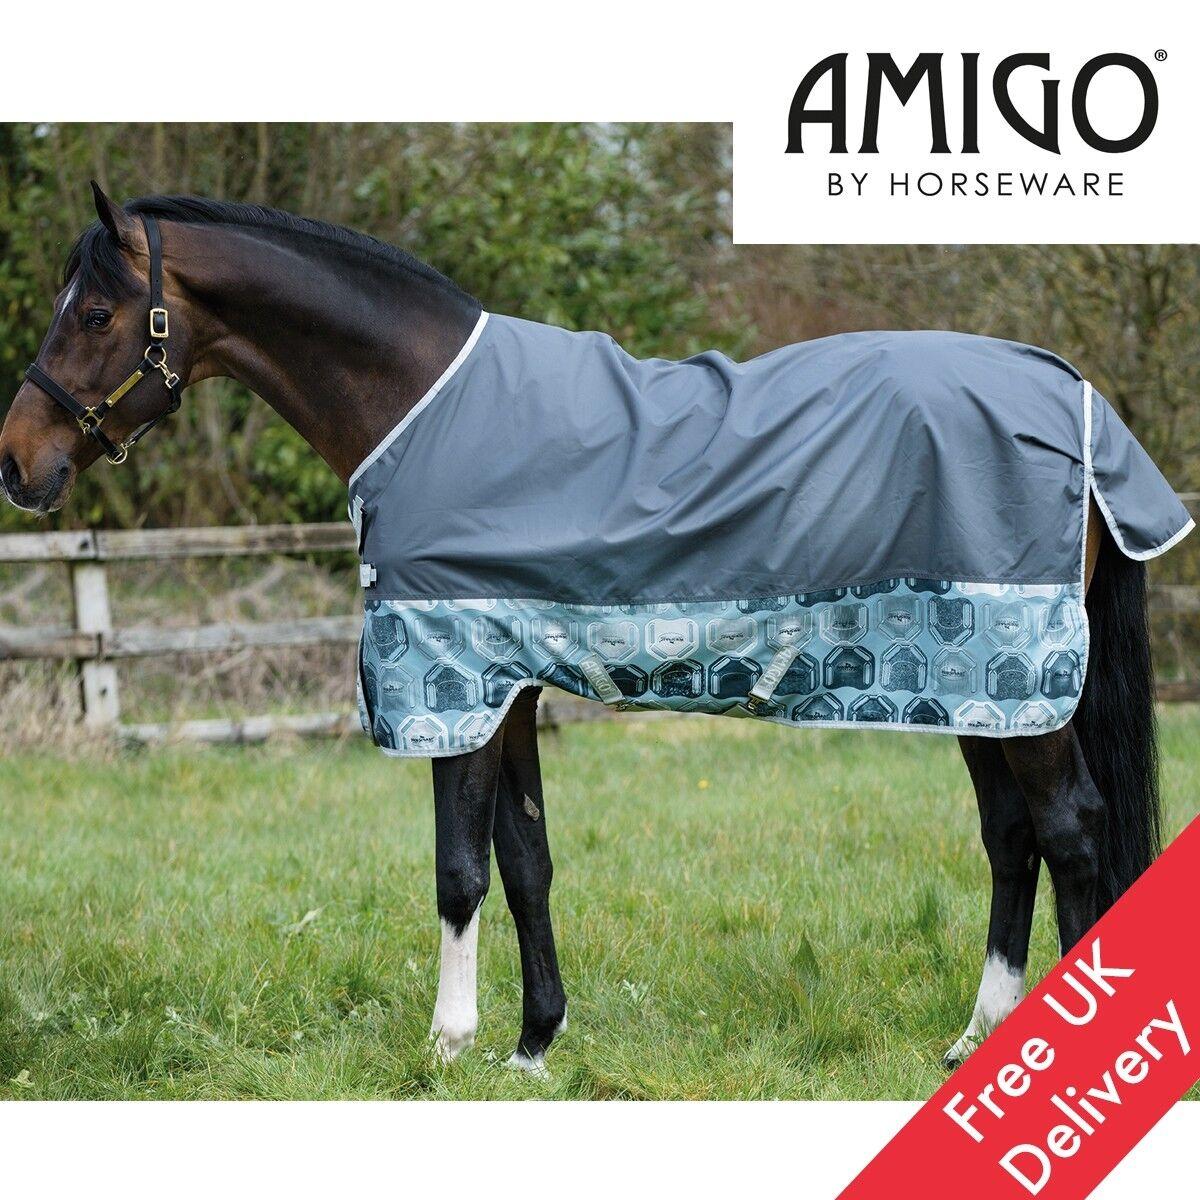 Horseware Amigo Hero 6 Lite Lightweight Turnout Rug AART71 FREE UK Shipping